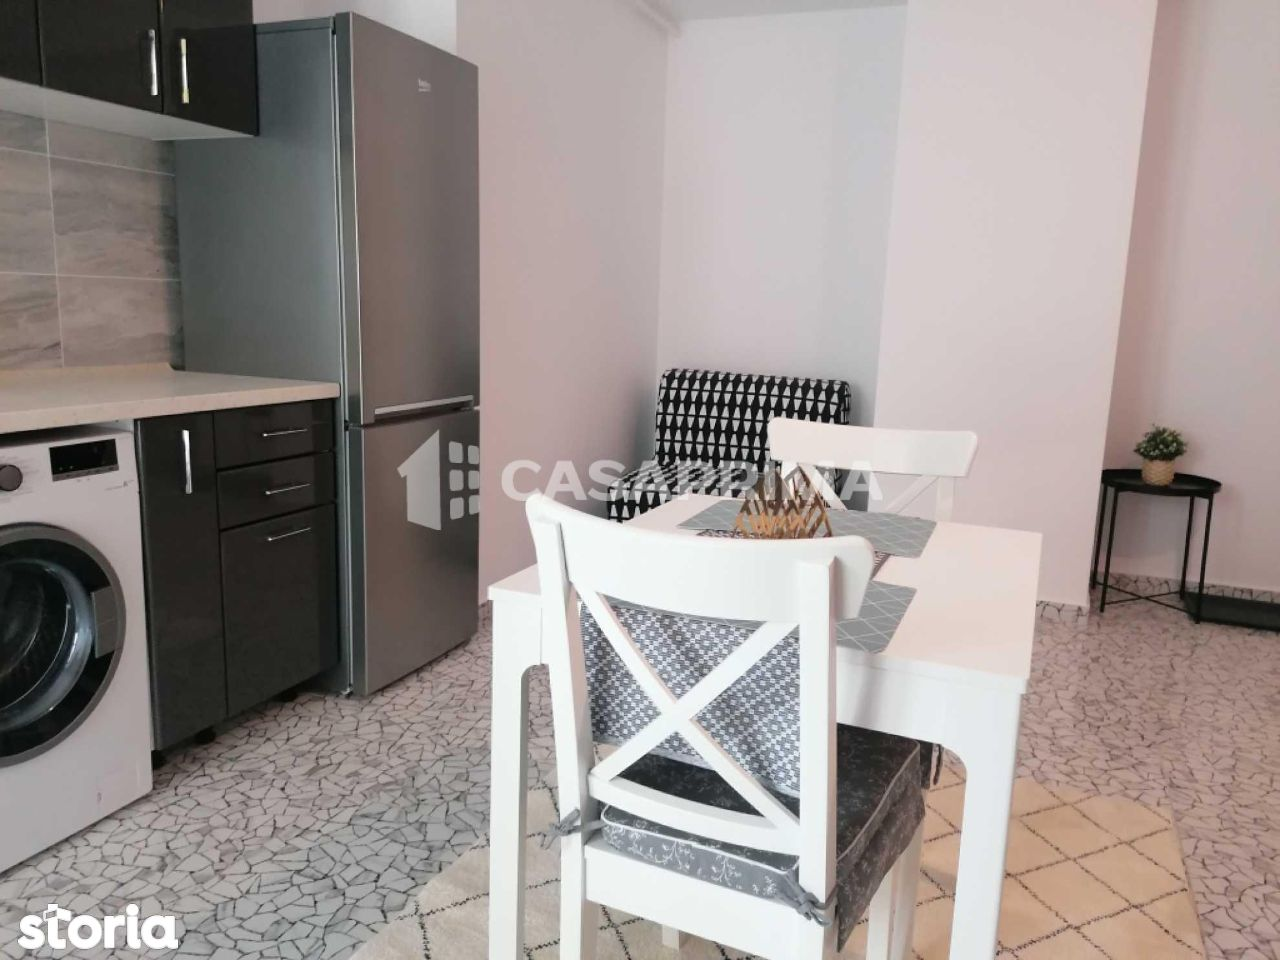 Apartament 2 camere, Lazar Residence, Etaj 2, NOU, Prima inchiriere